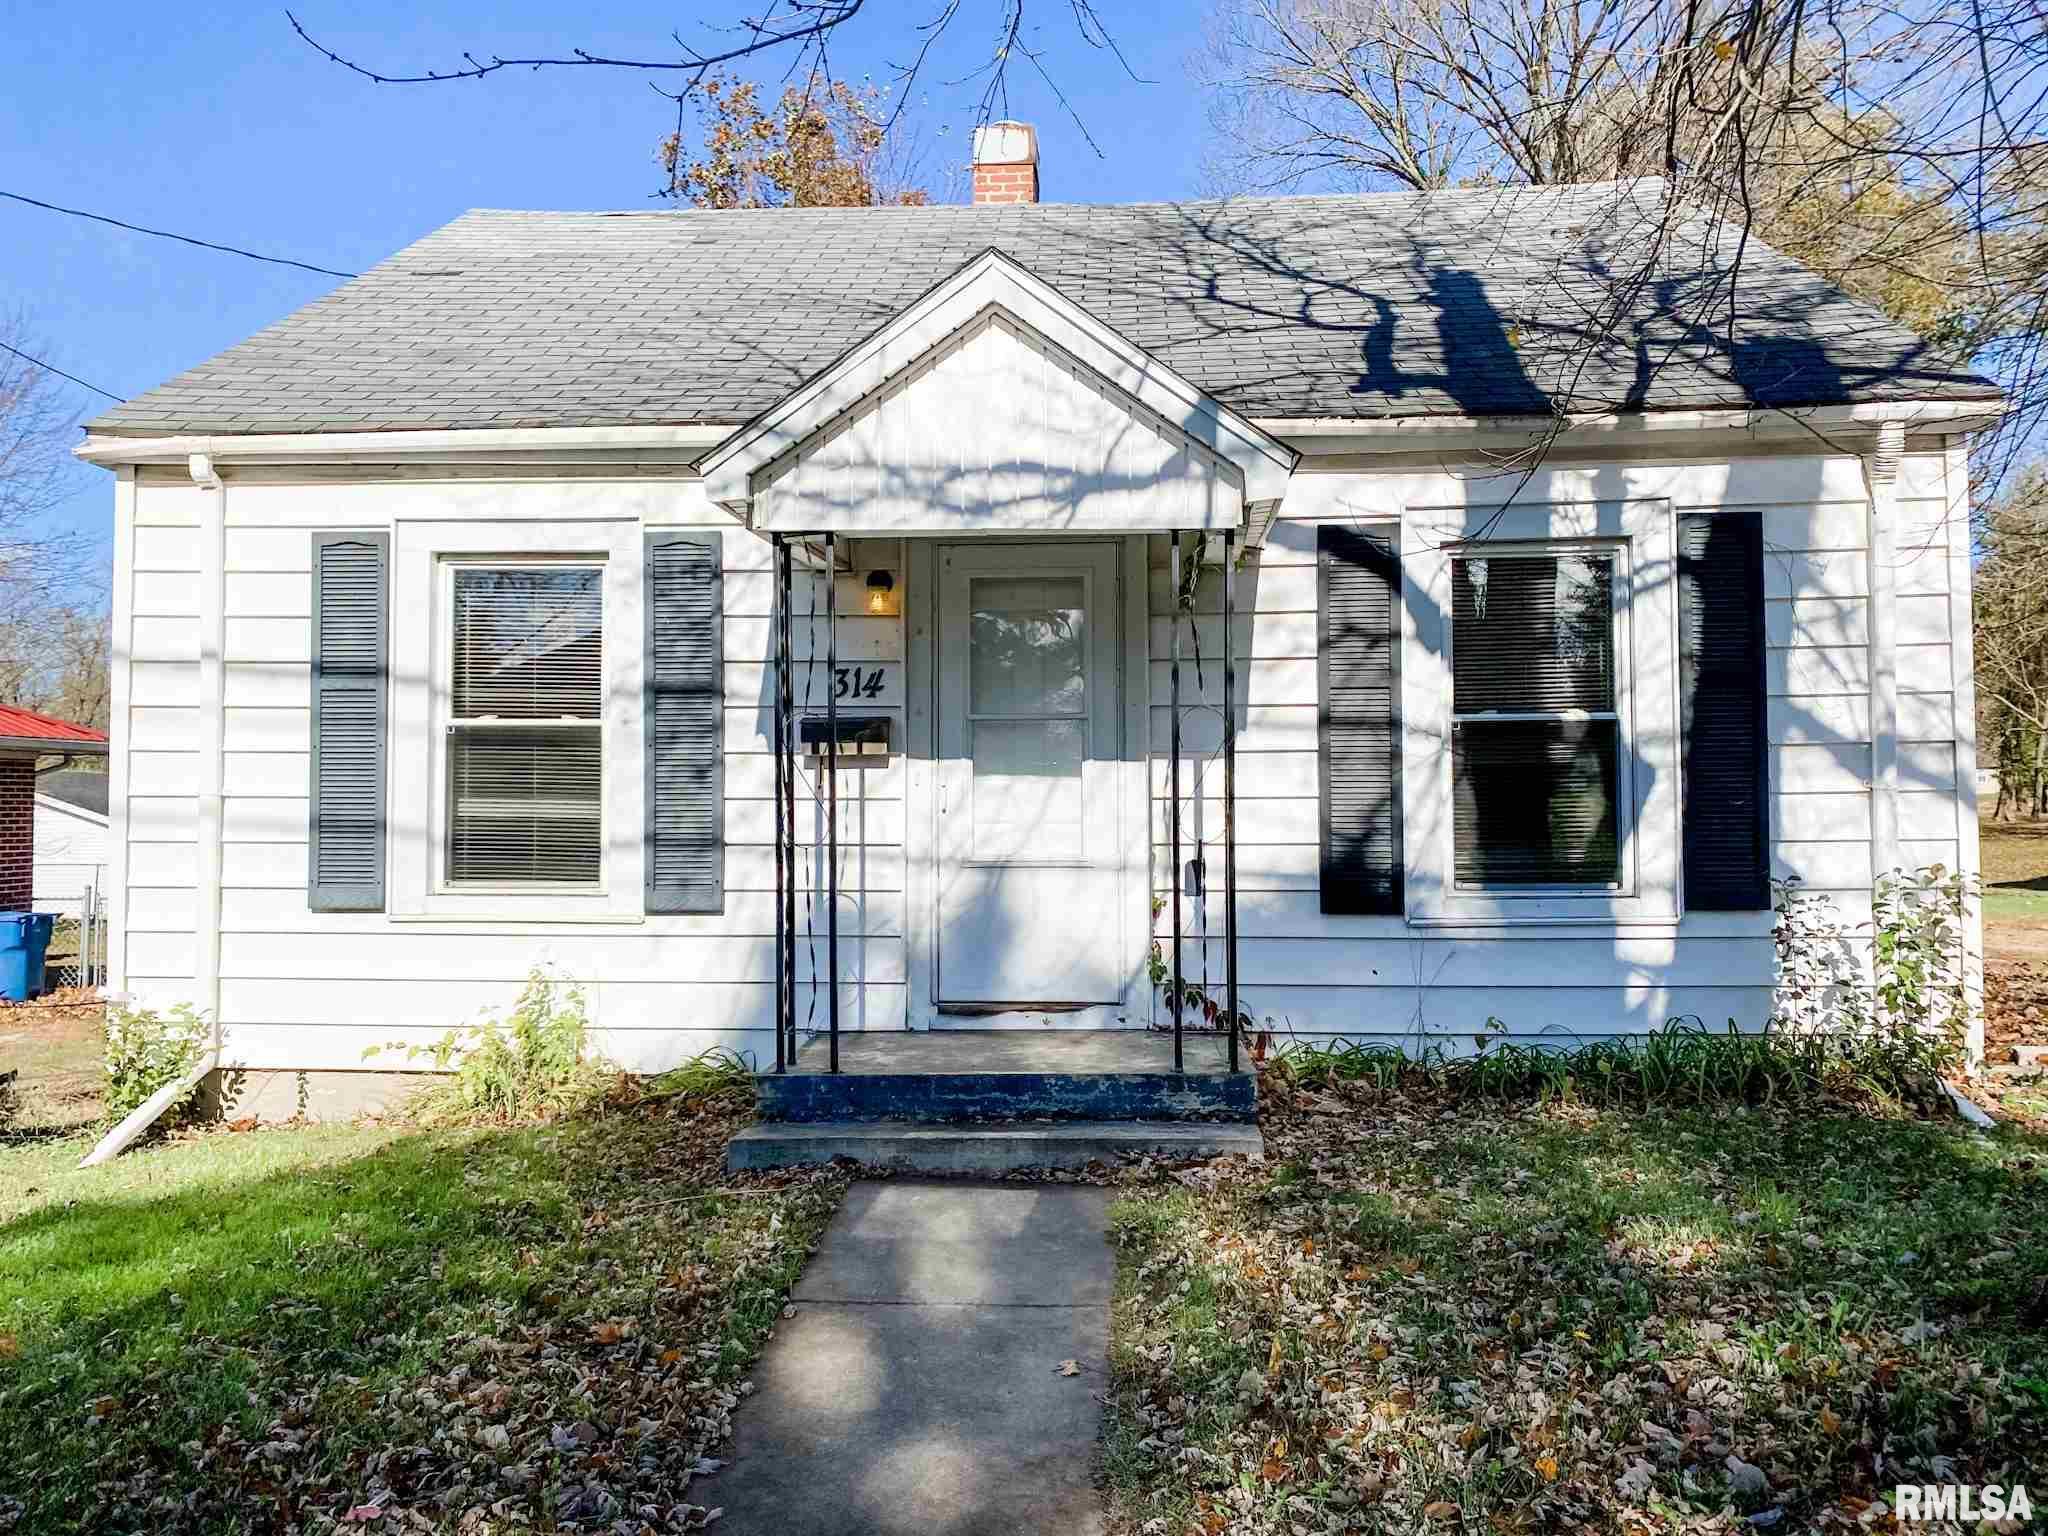 314 E GRAND Property Photo - Carterville, IL real estate listing